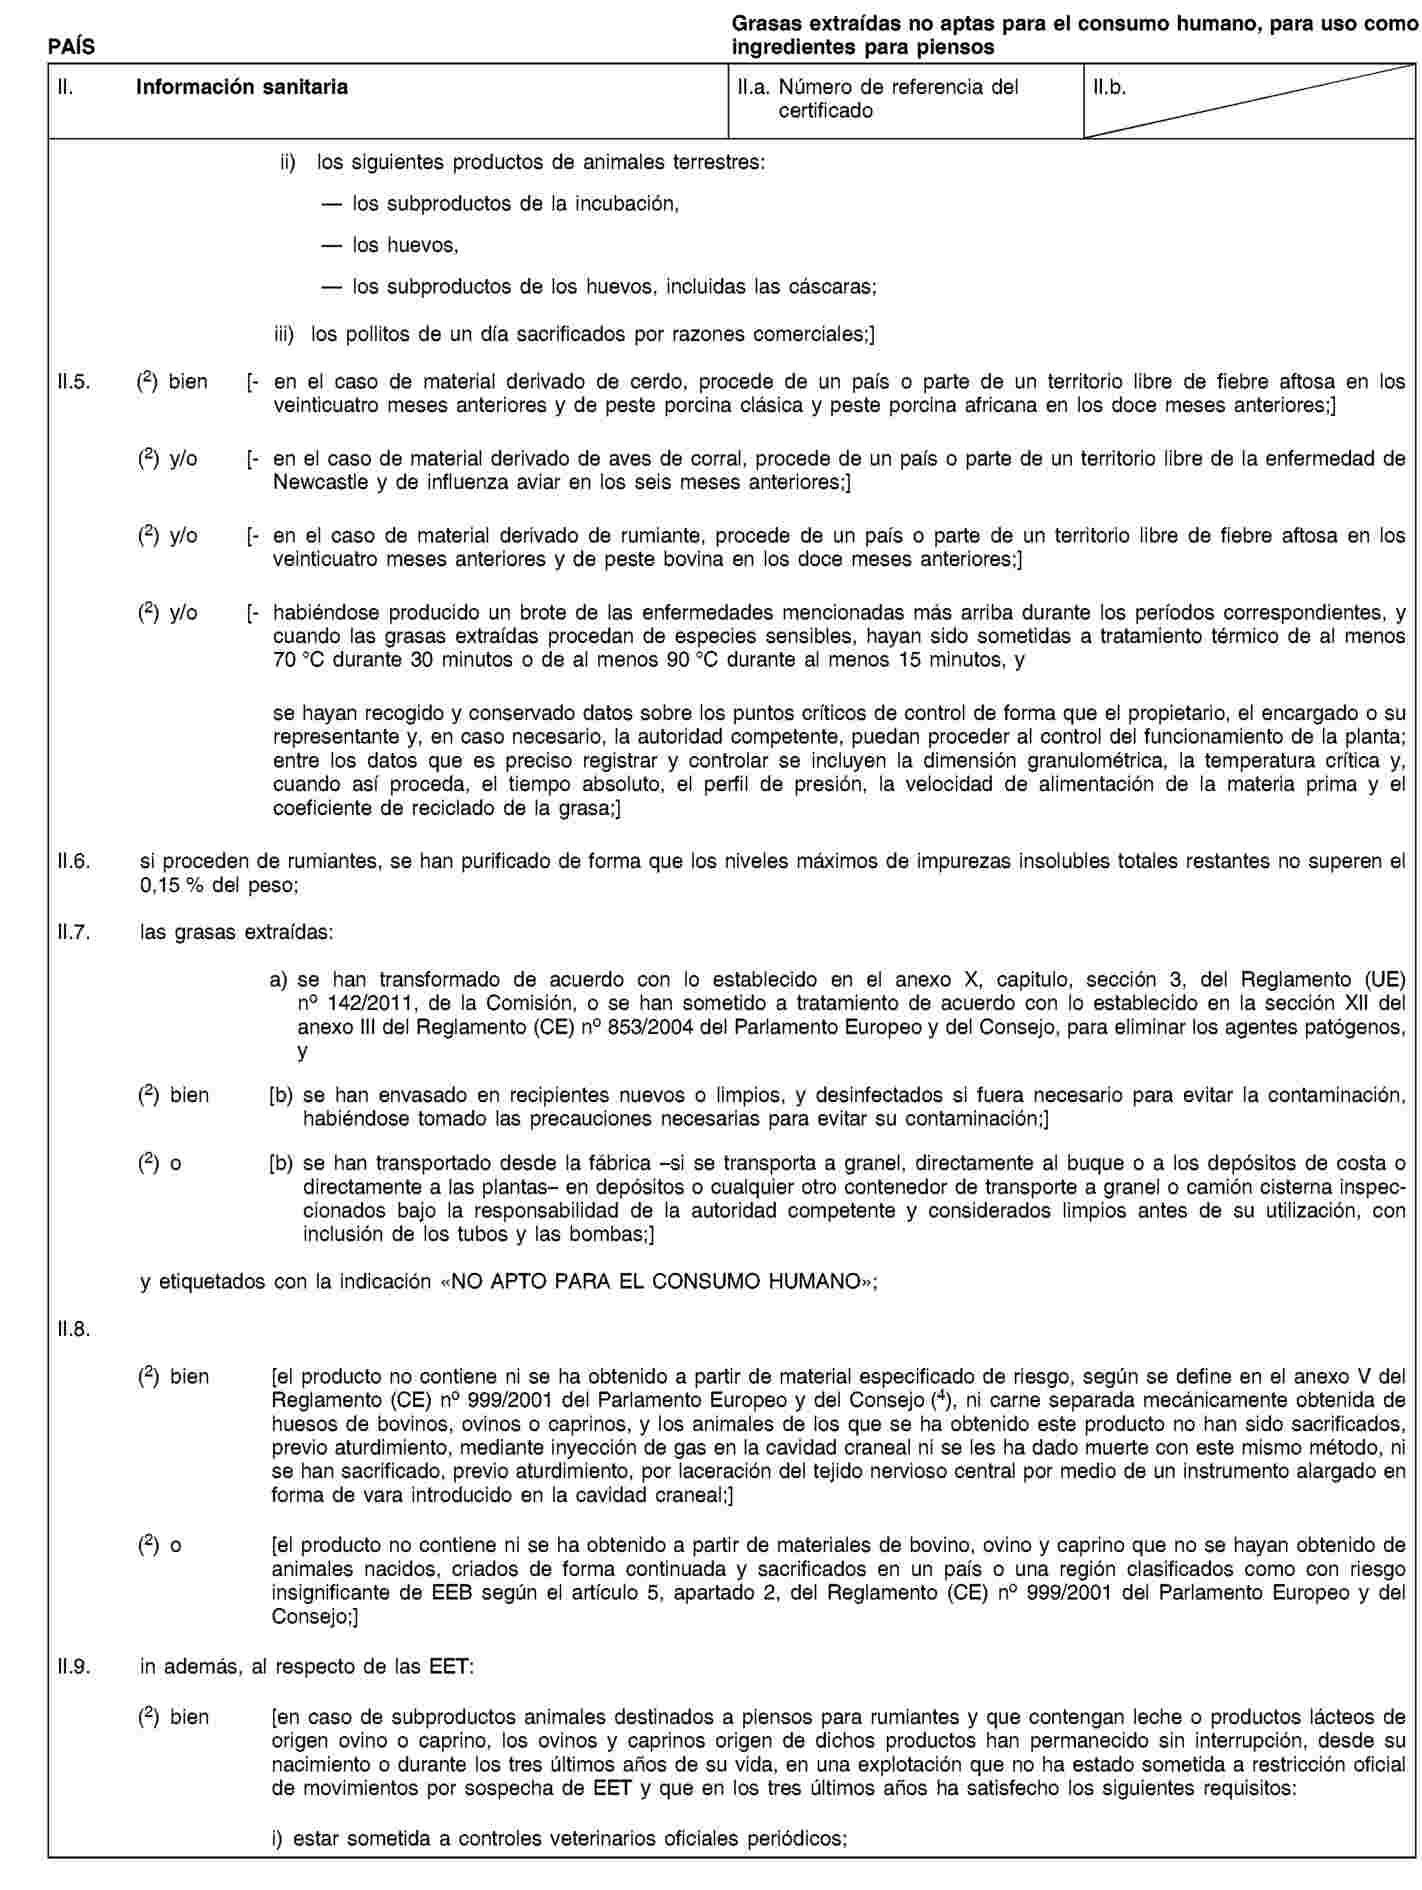 Imagen: https://eur-lex.europa.eu/resource.html?uri=uriserv:OJ.L_.2011.054.01.0001.01.SPA.xhtml.L_2011054ES.01020701.tif.jpg